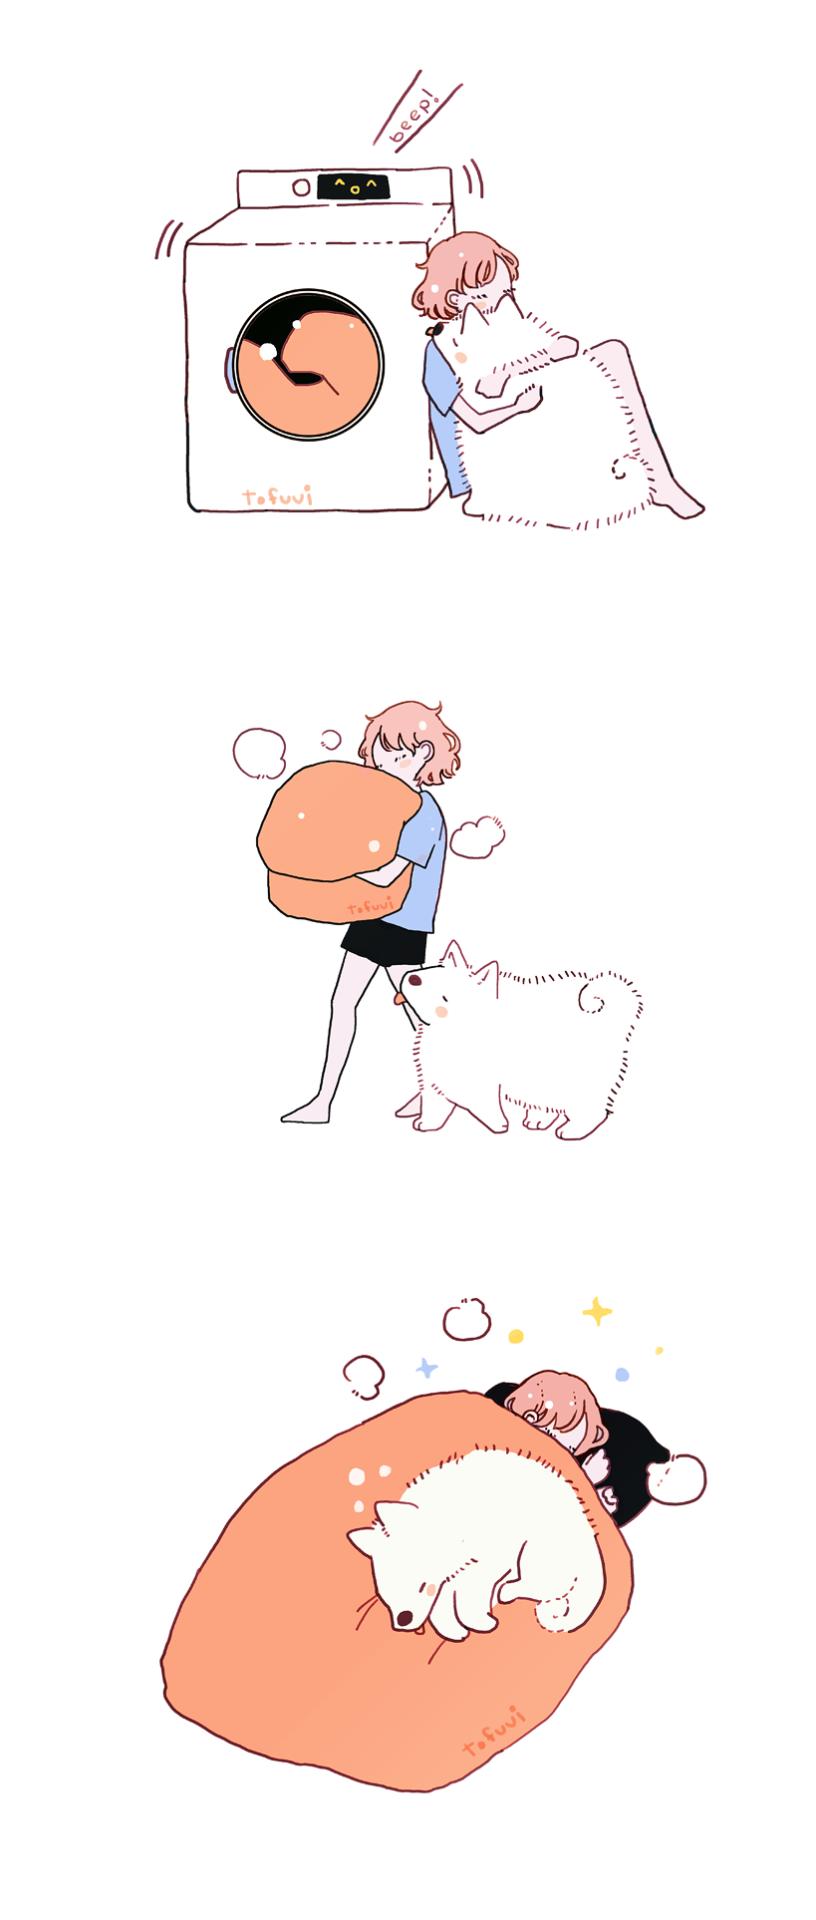 tofuvi doodles